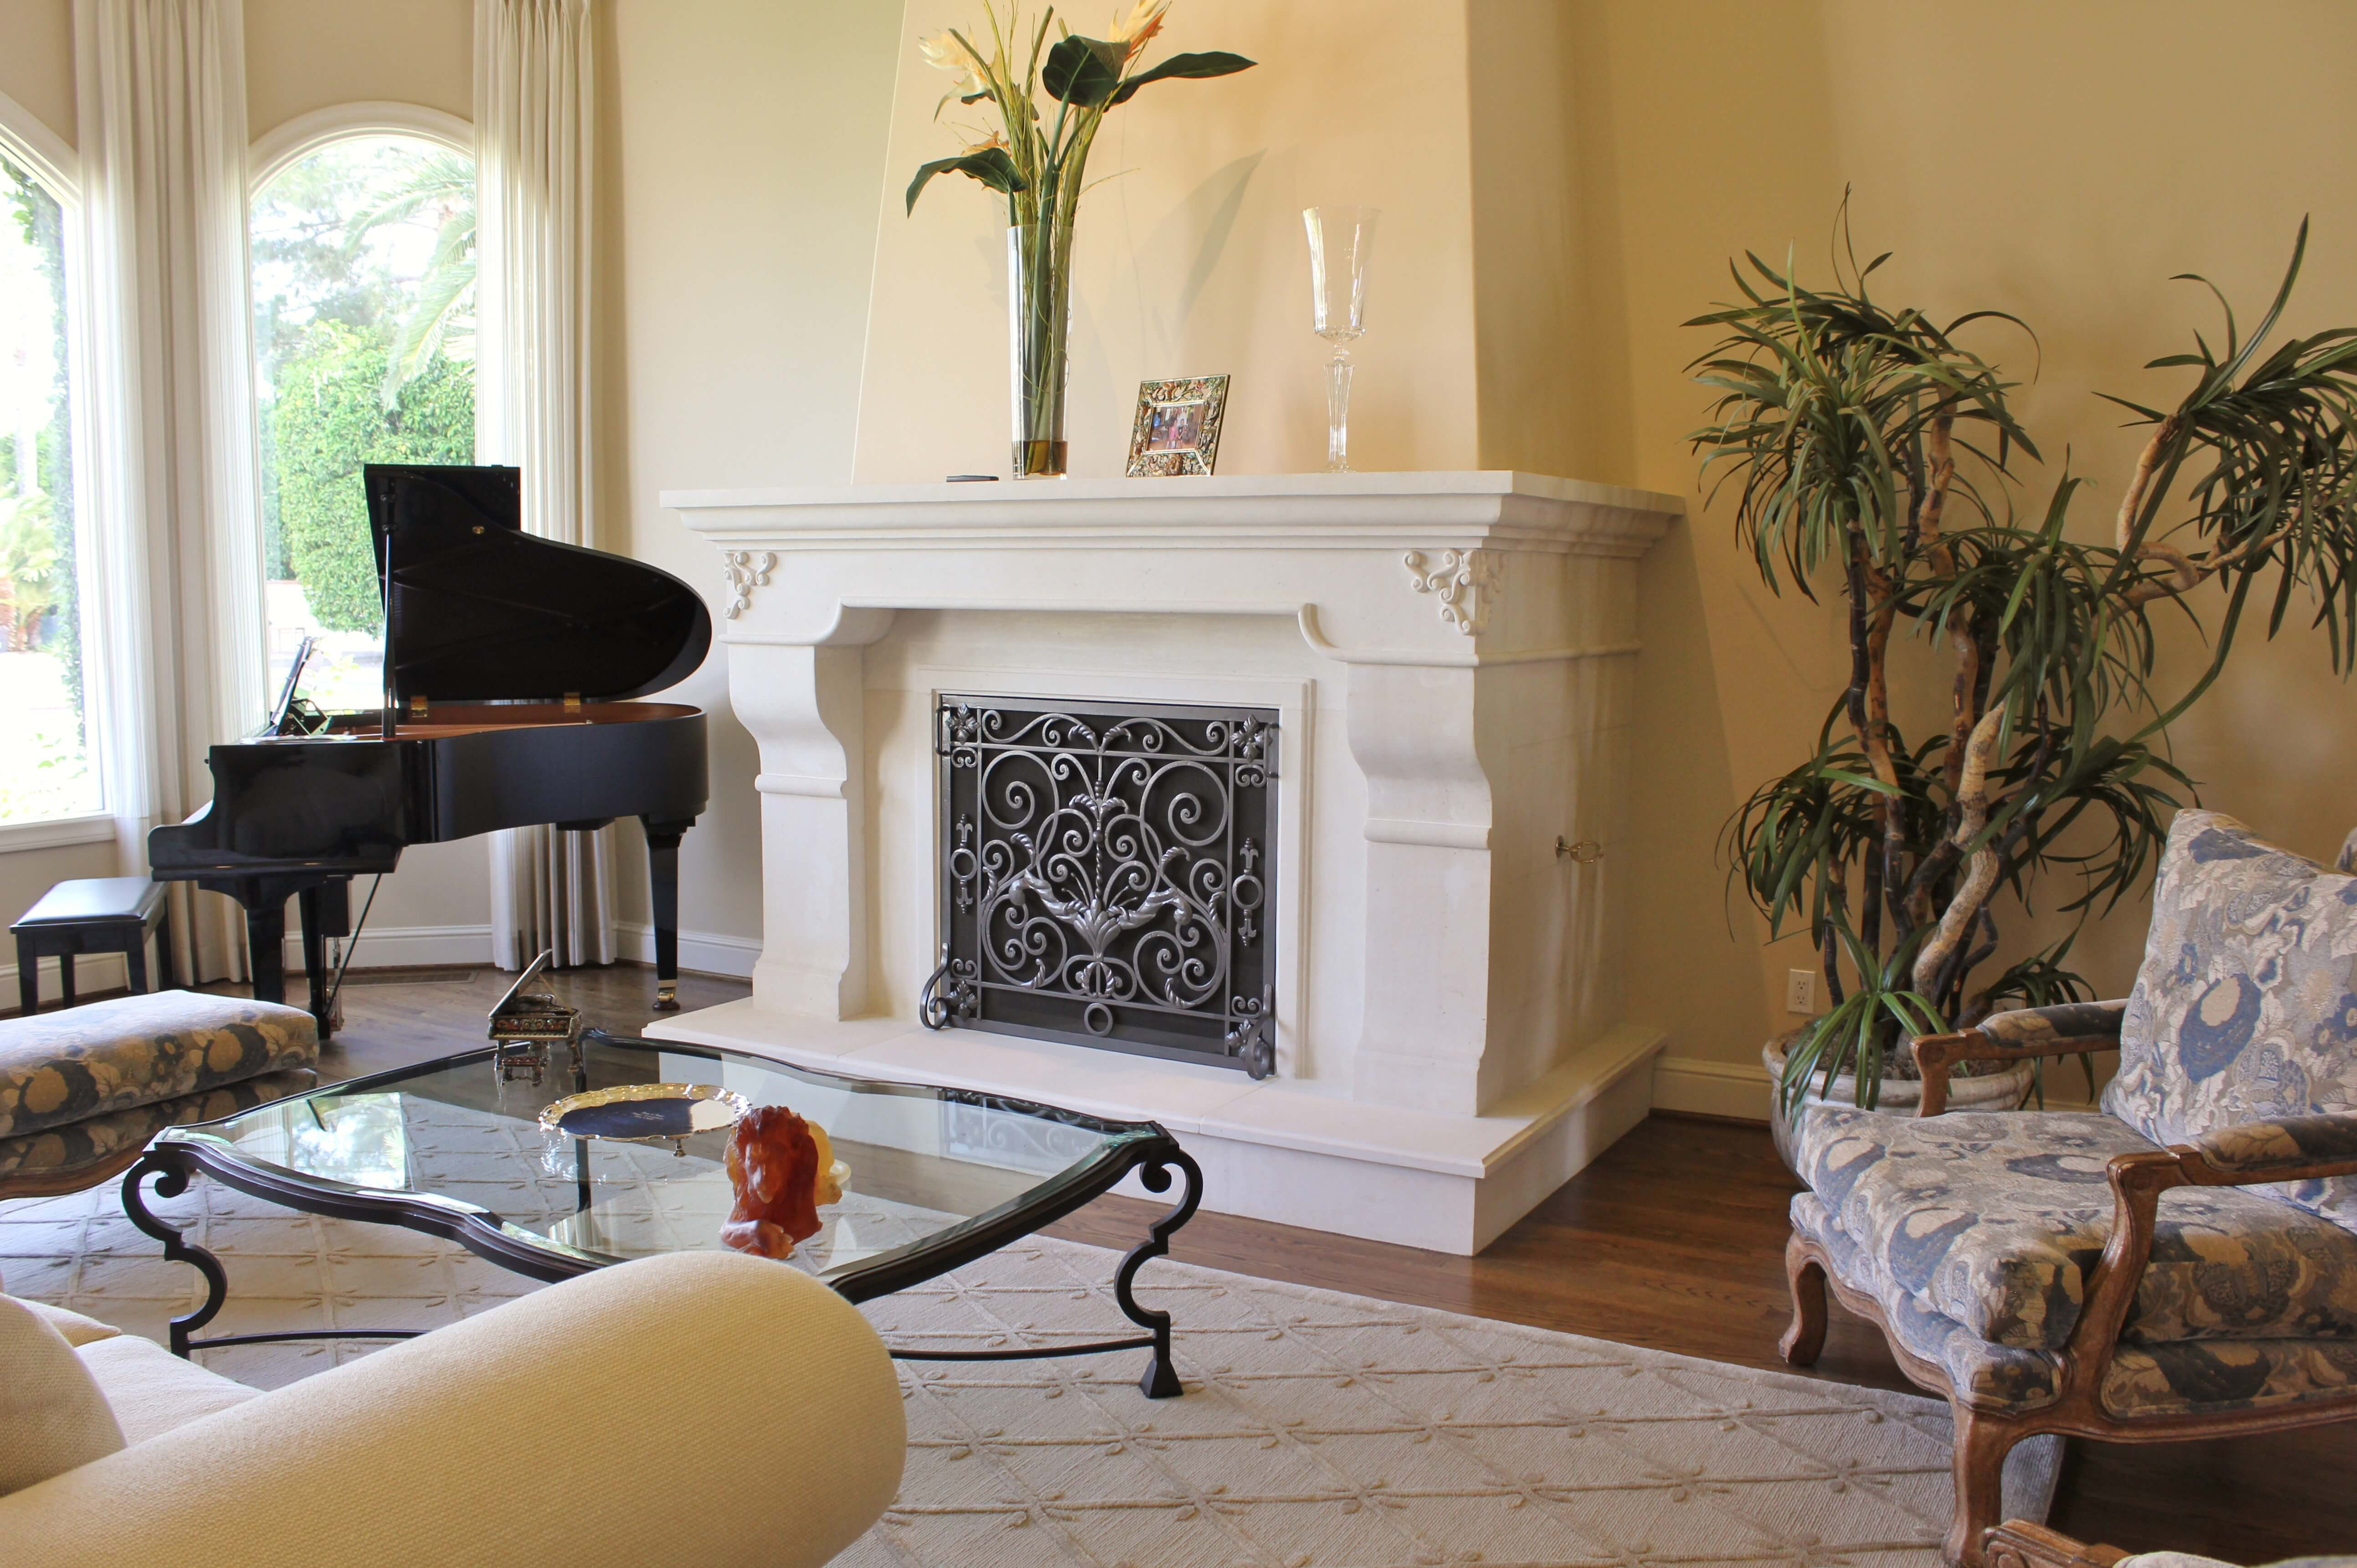 1-Elegant-Living-Room-Fireplace-Surround-in-Bianca-Limestone